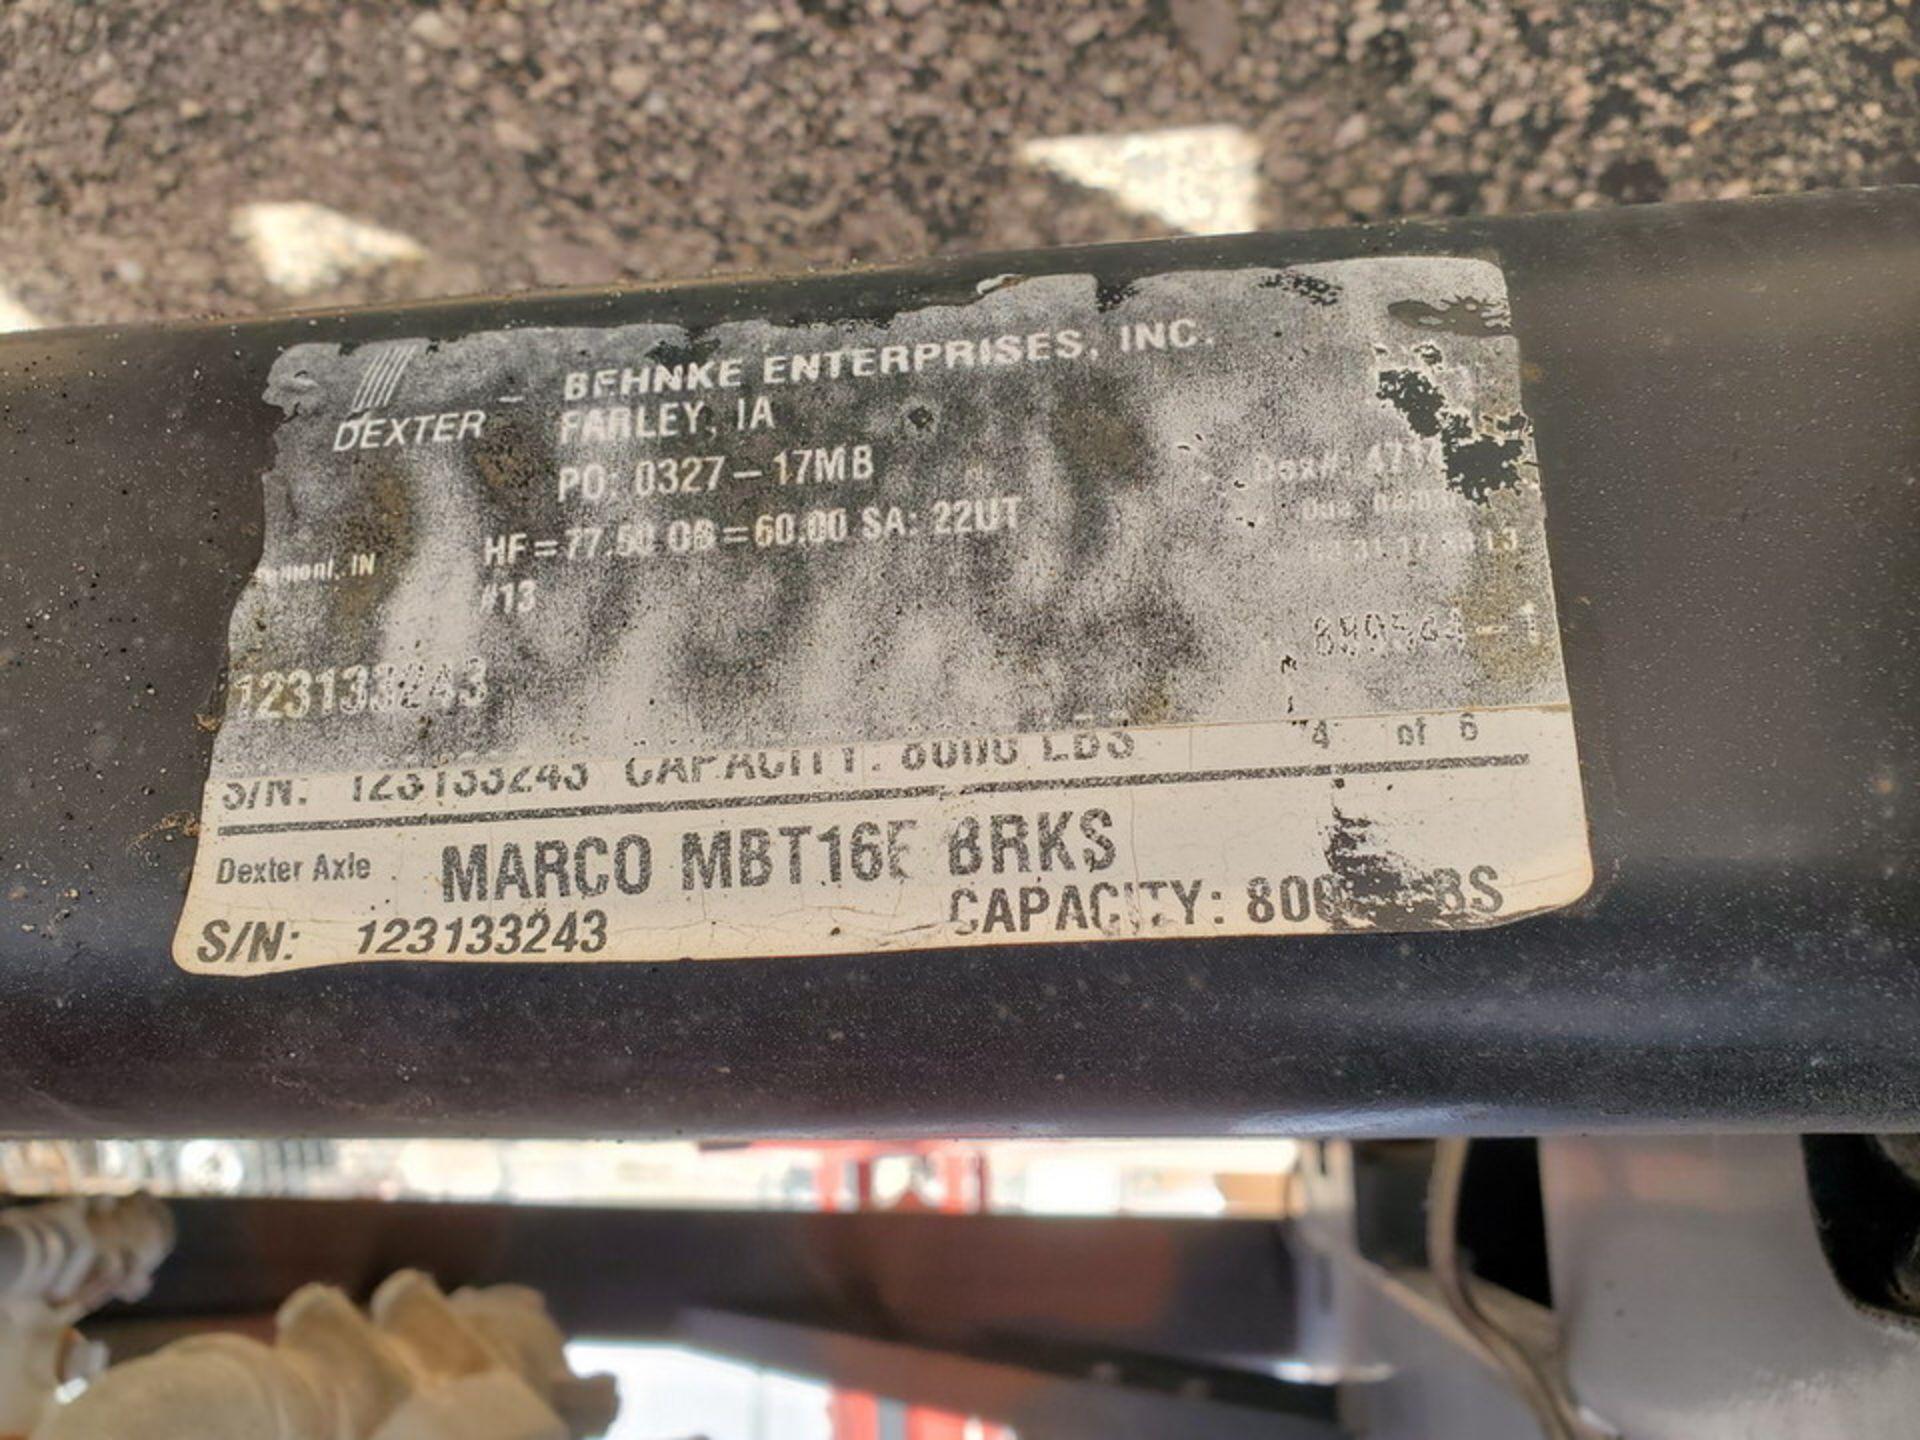 "2017 Marco Sand Blast Master Portable Sandblast Unit 150psi@250F, -20F@150psi, Vessel Dims: 48"" Seam - Image 16 of 18"